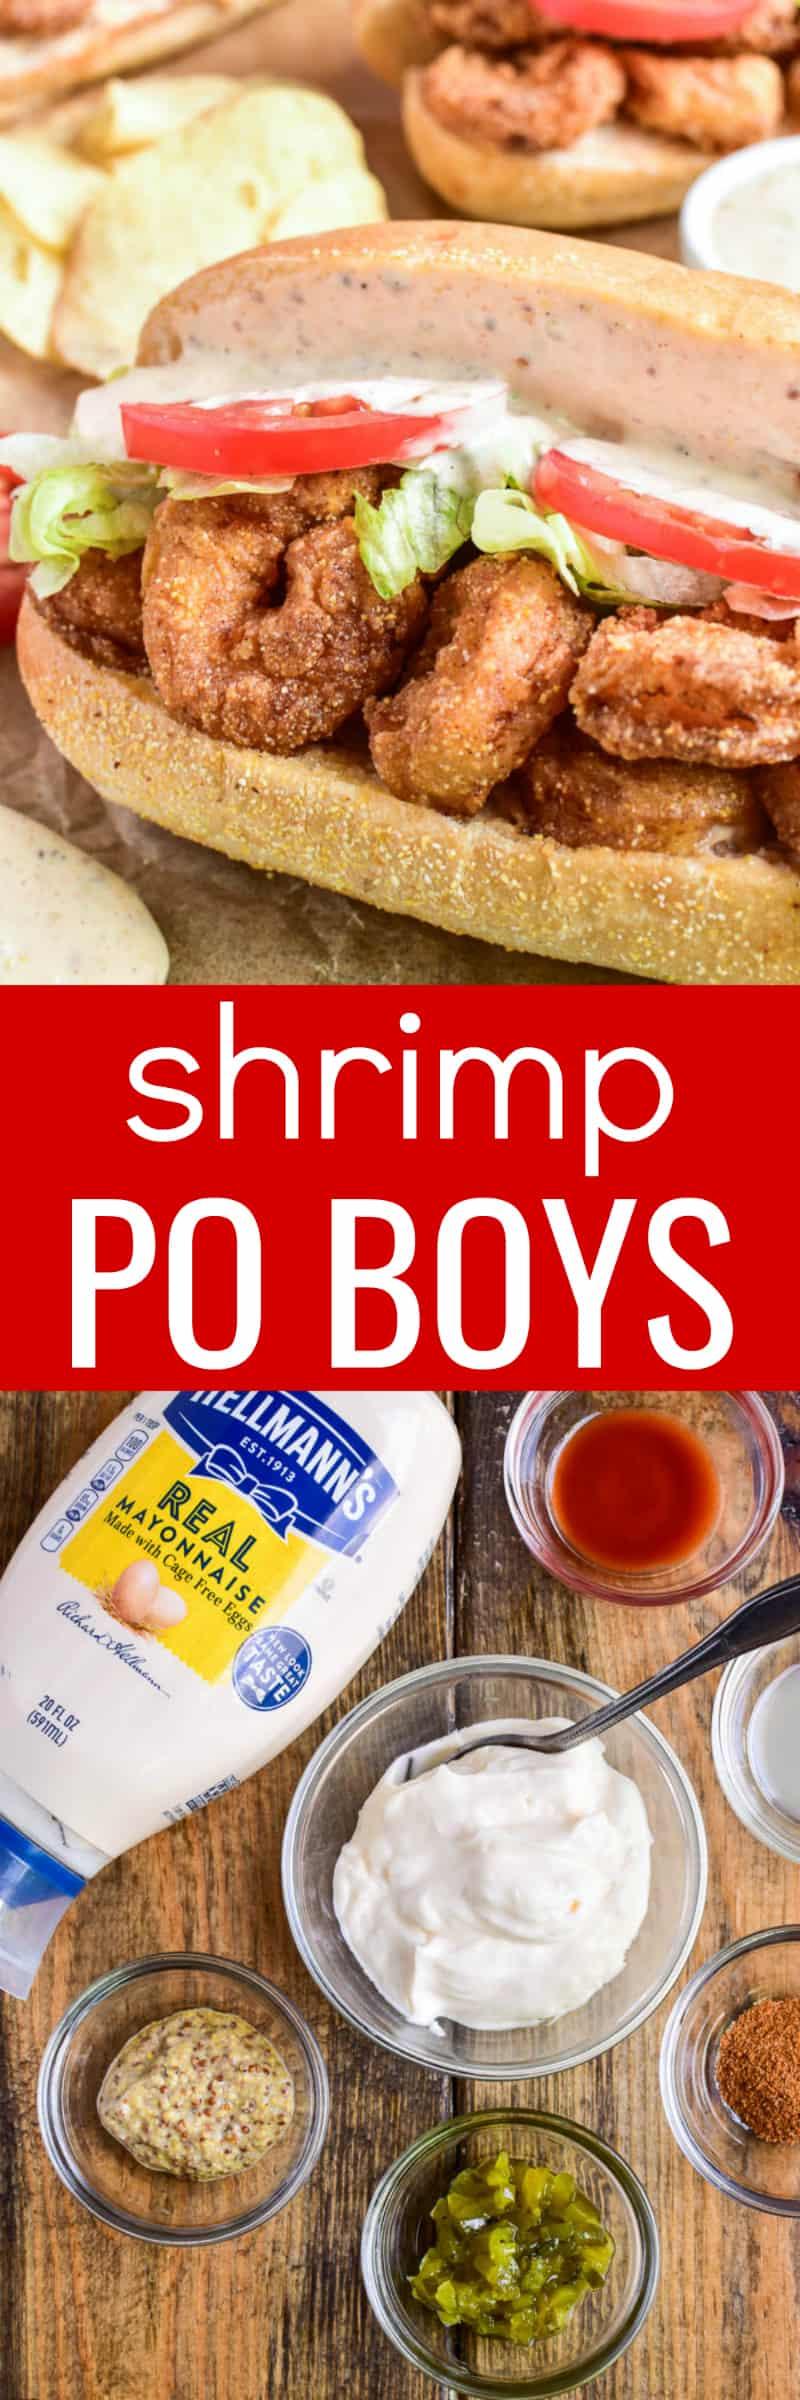 Collage image of Shrimp Po Boys